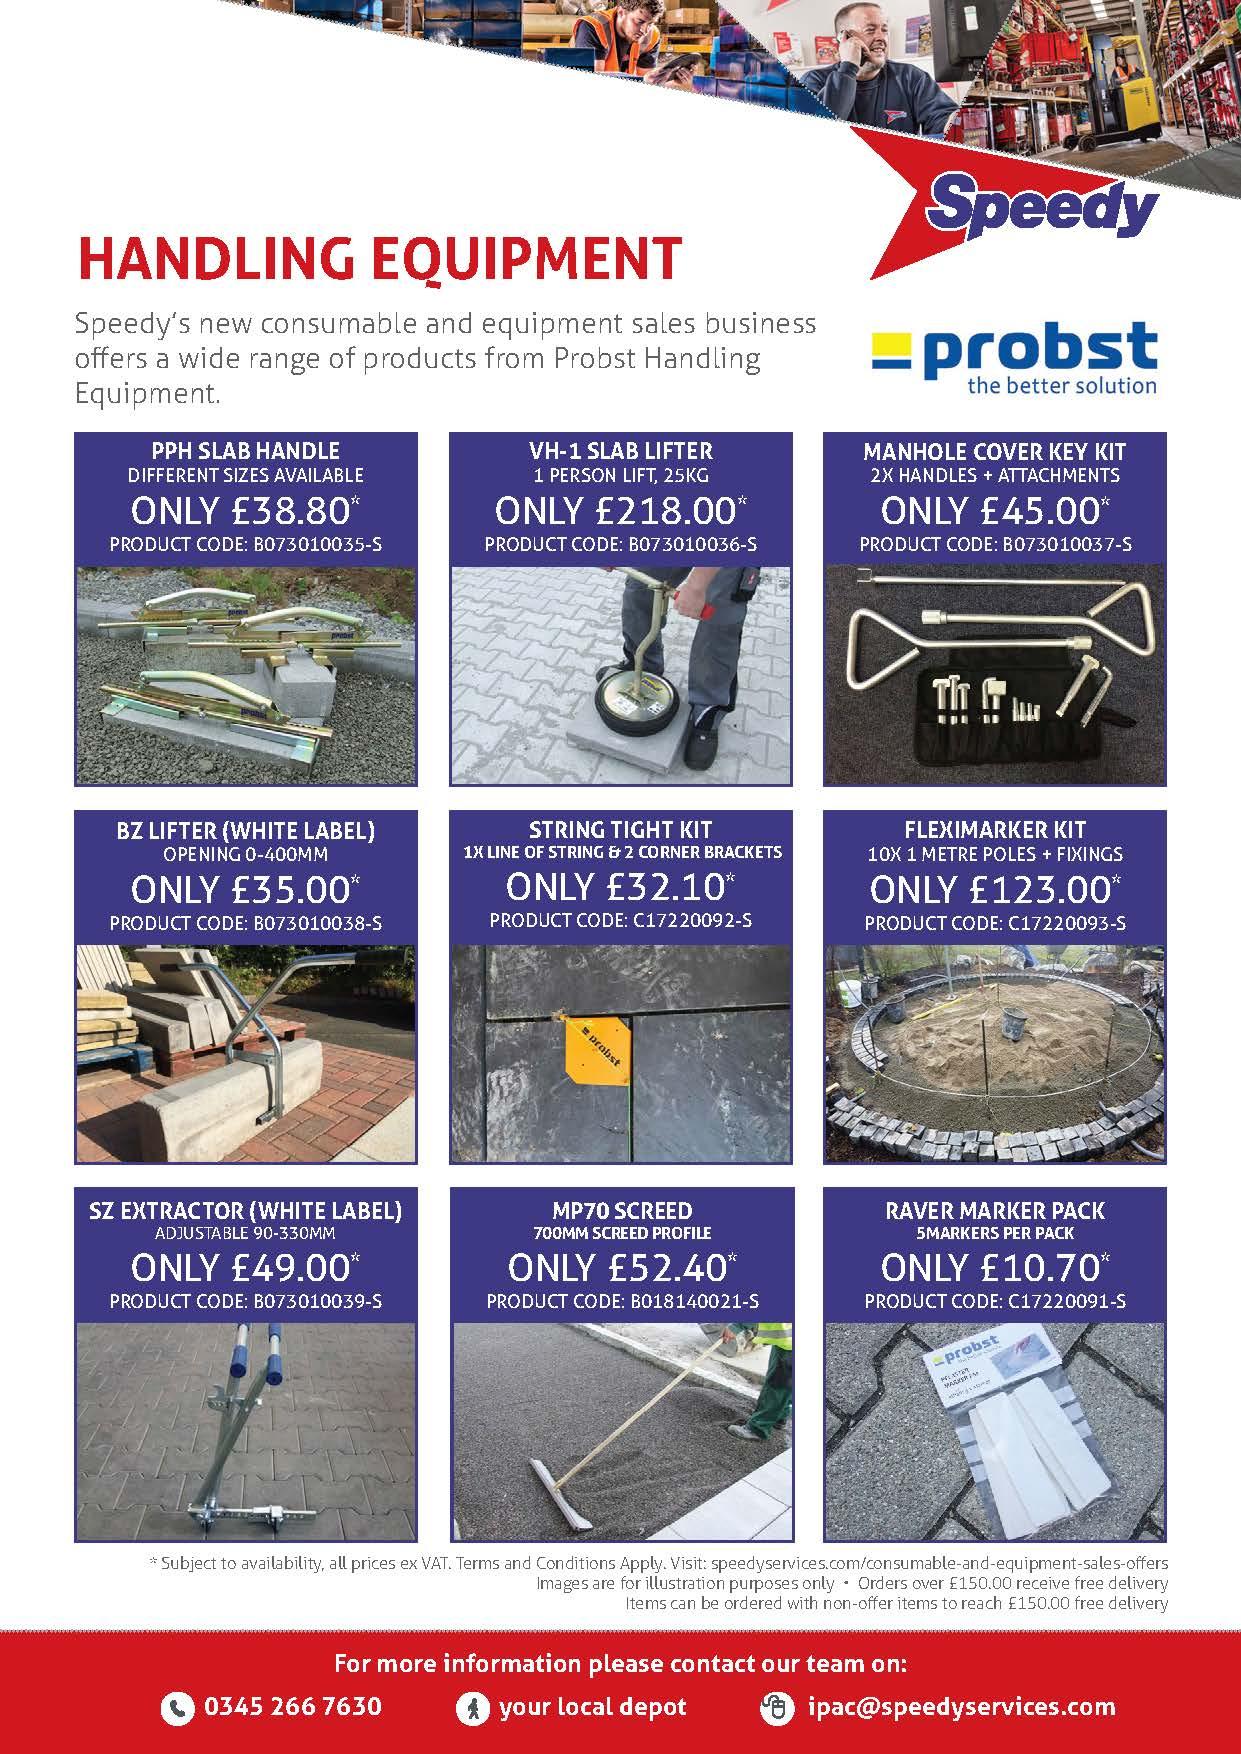 iPAC Handling Equipment Offers_PROOF (2).jpg